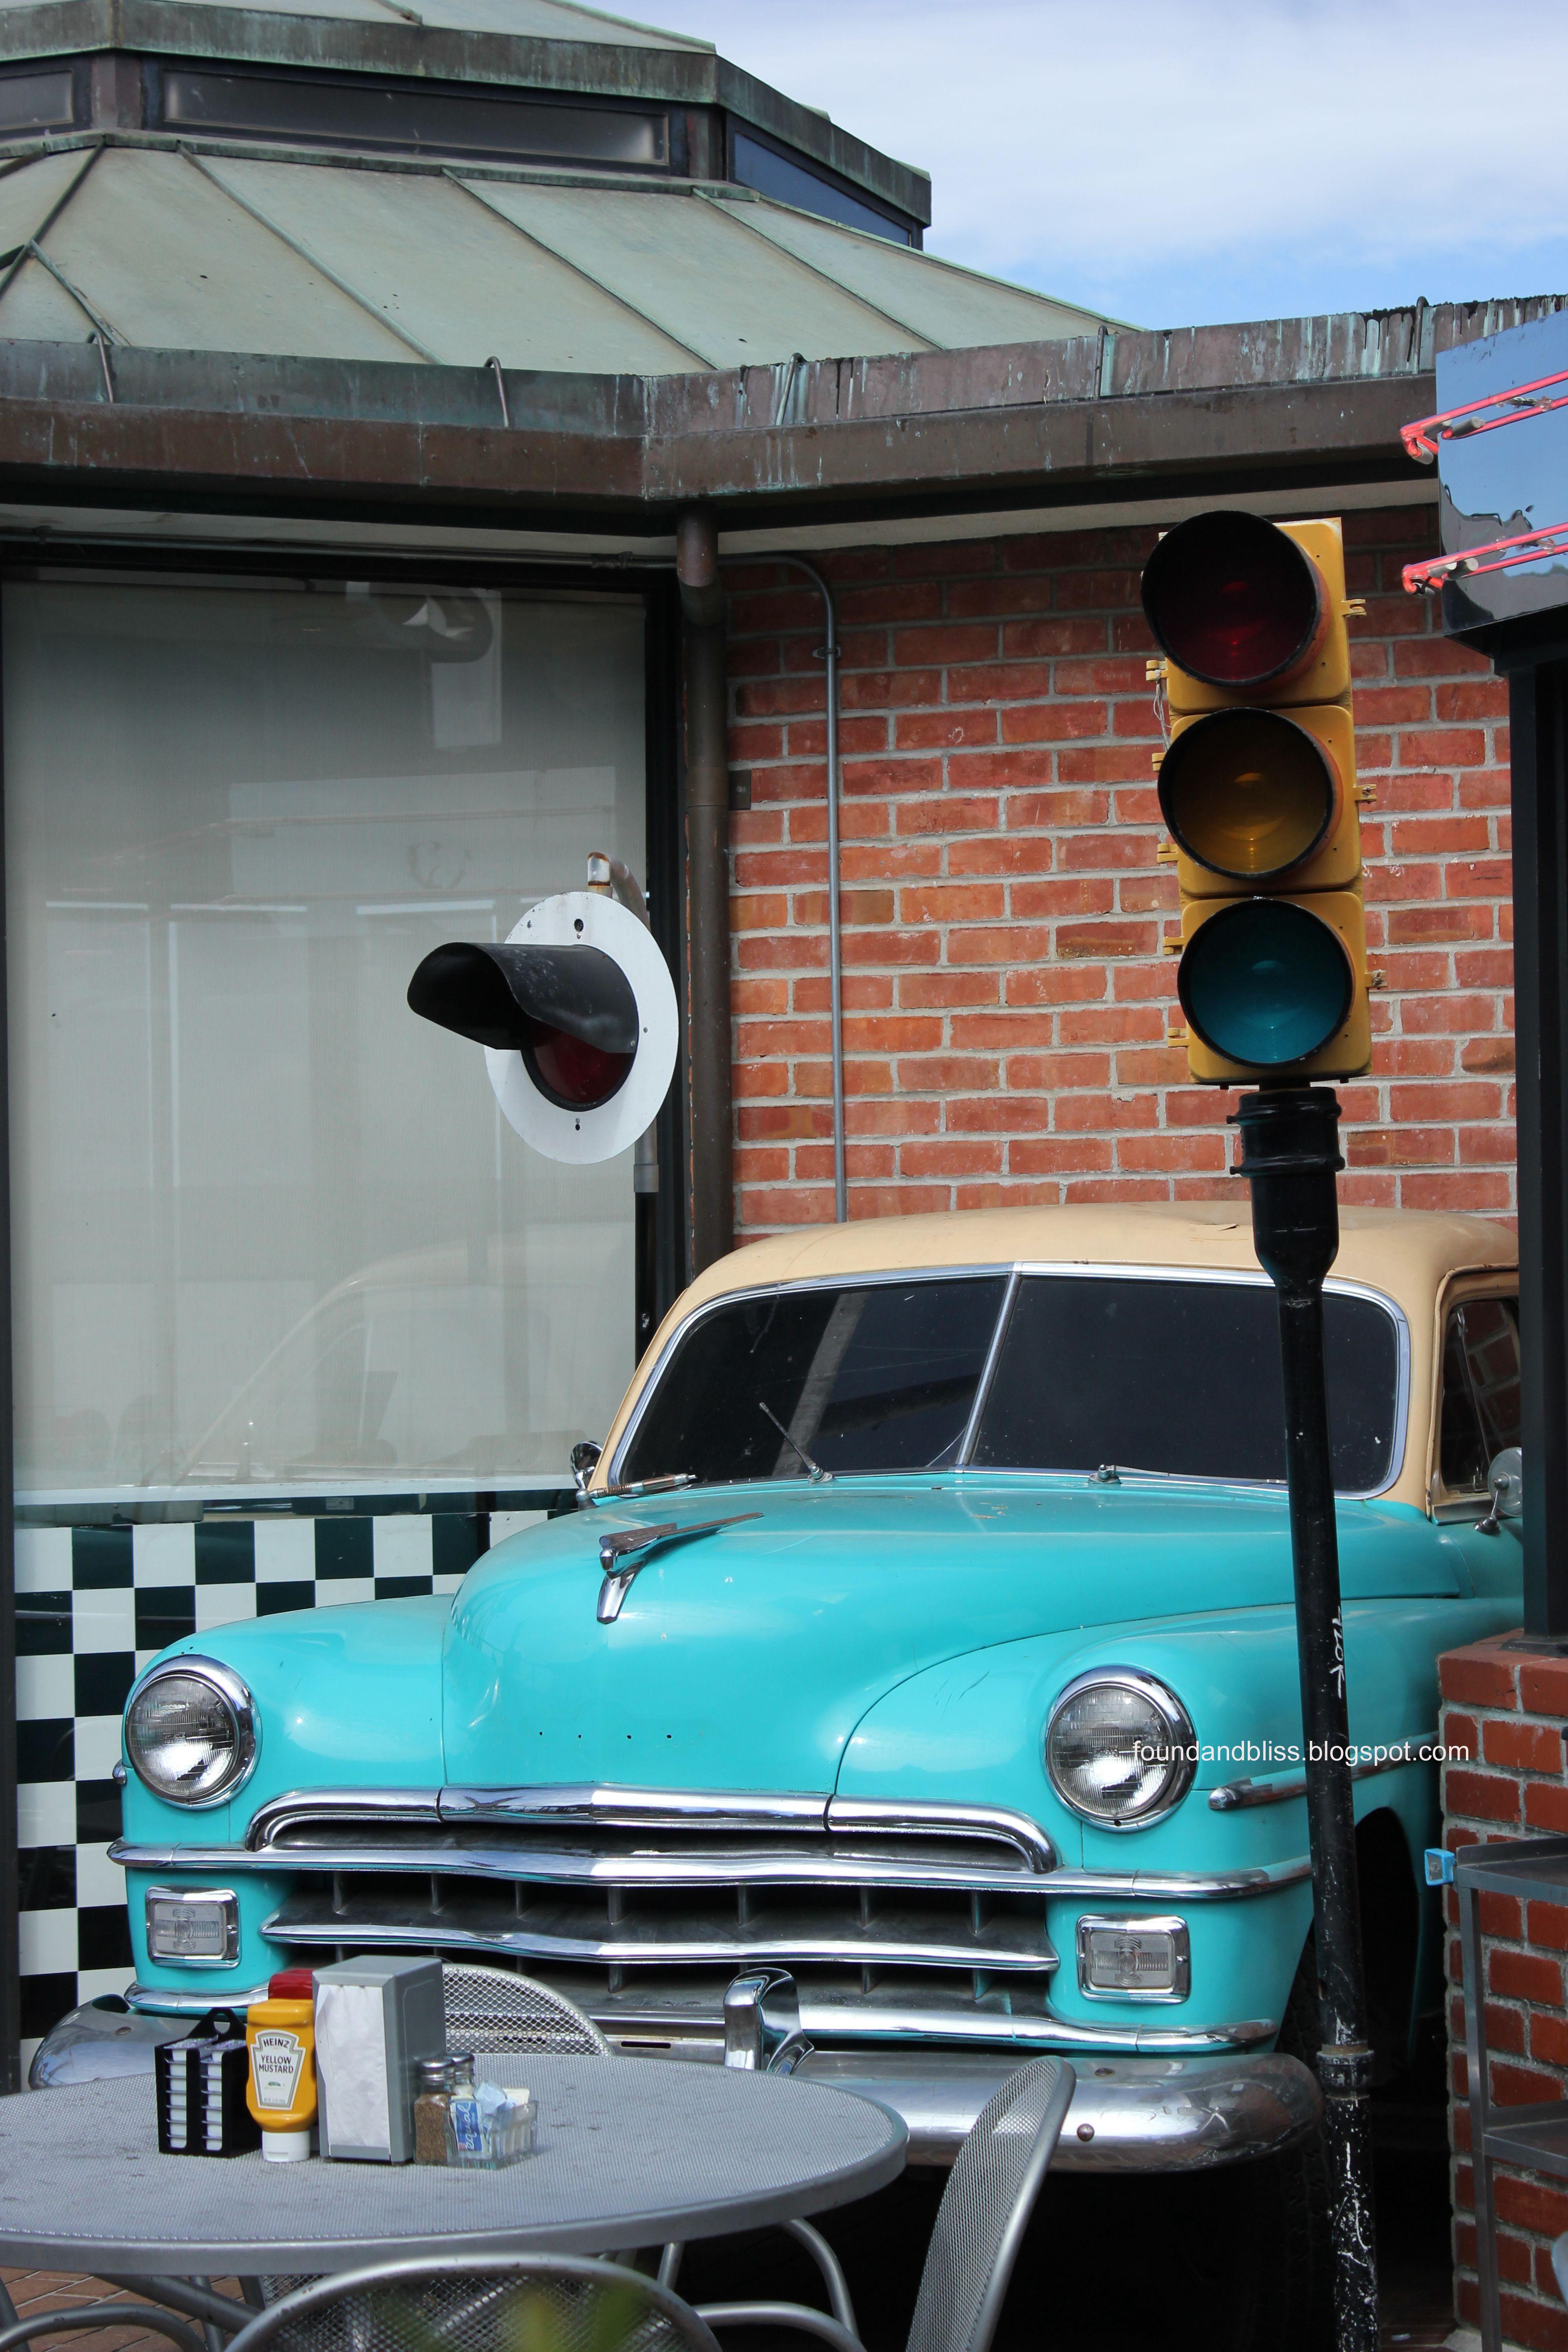 Portland, Ore. (With images) | Bmw car, Bmw, Car